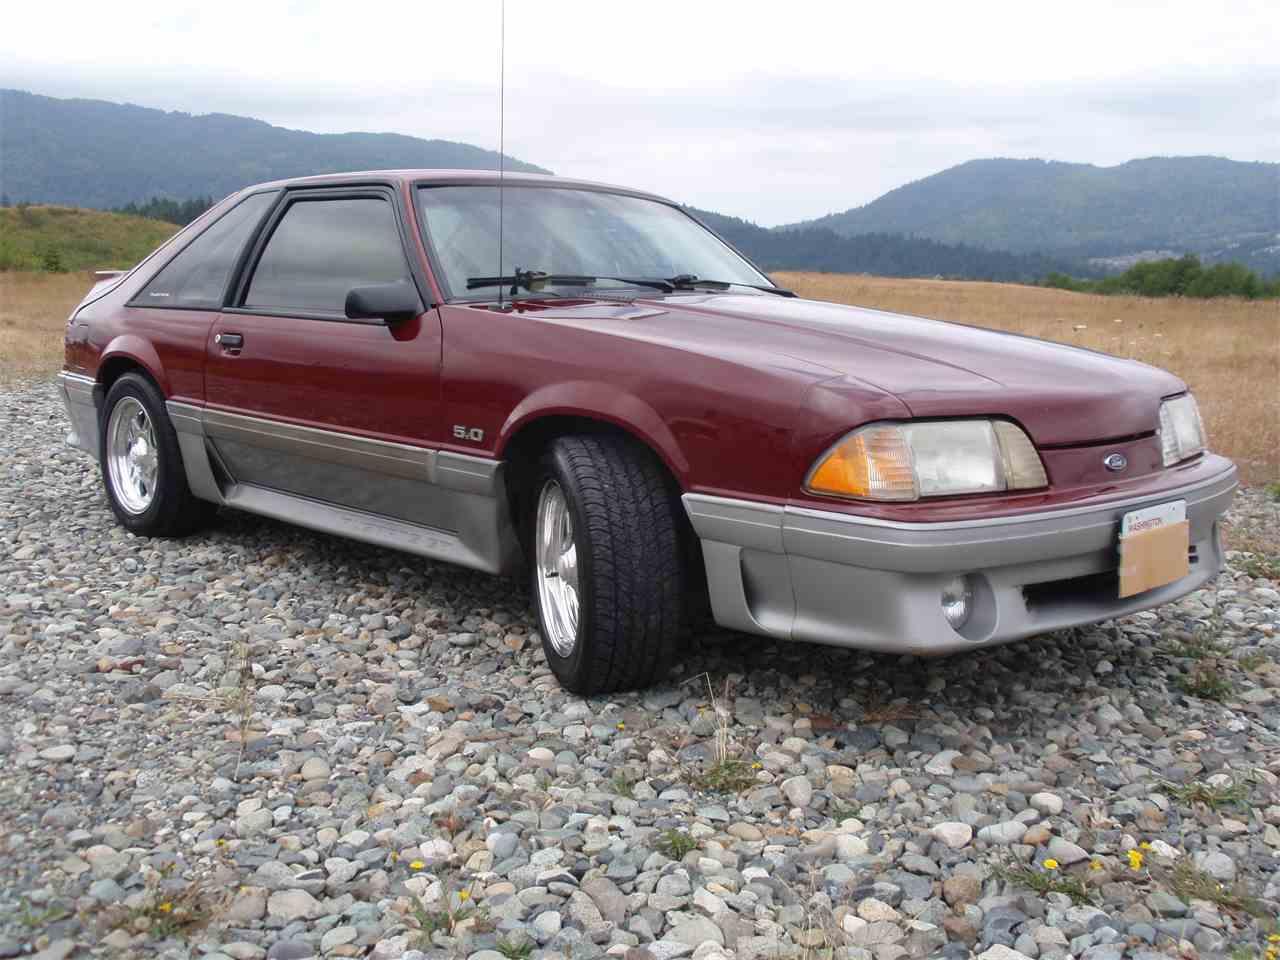 8696263-1989-ford-mustang-gt-std-c.jpg